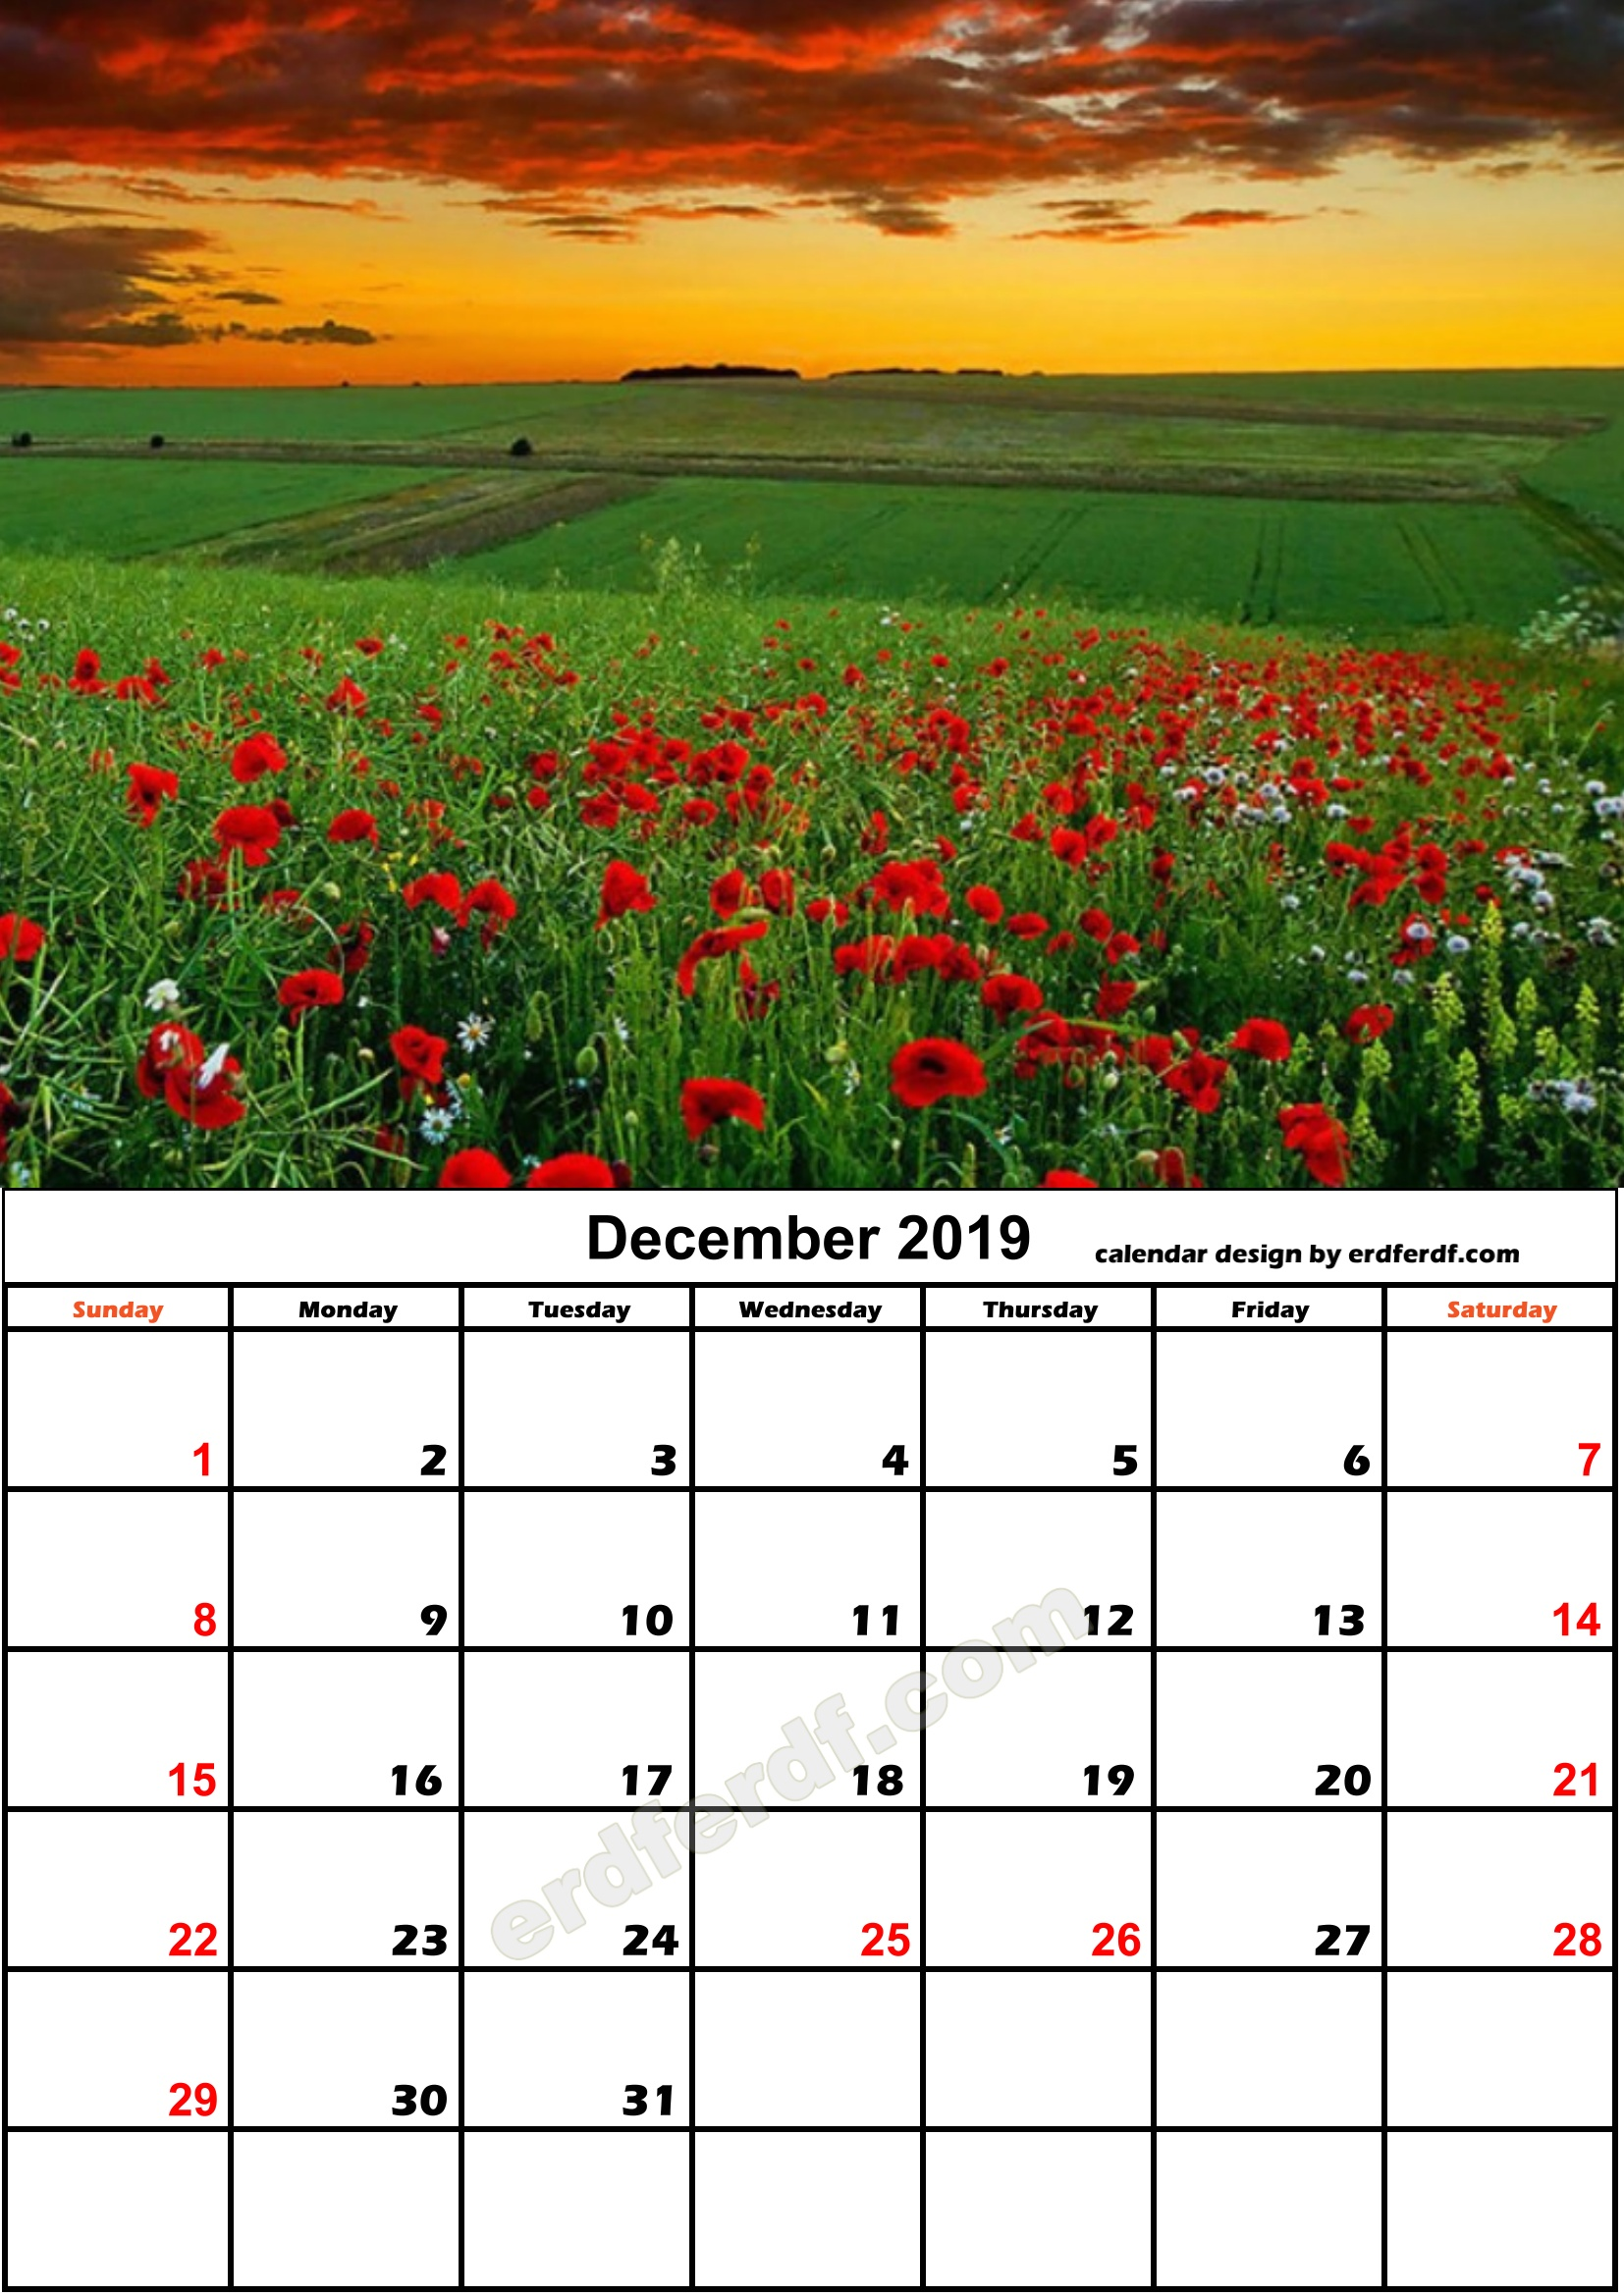 12 December Flower Nature Calendar Monthly 2019 Free Download